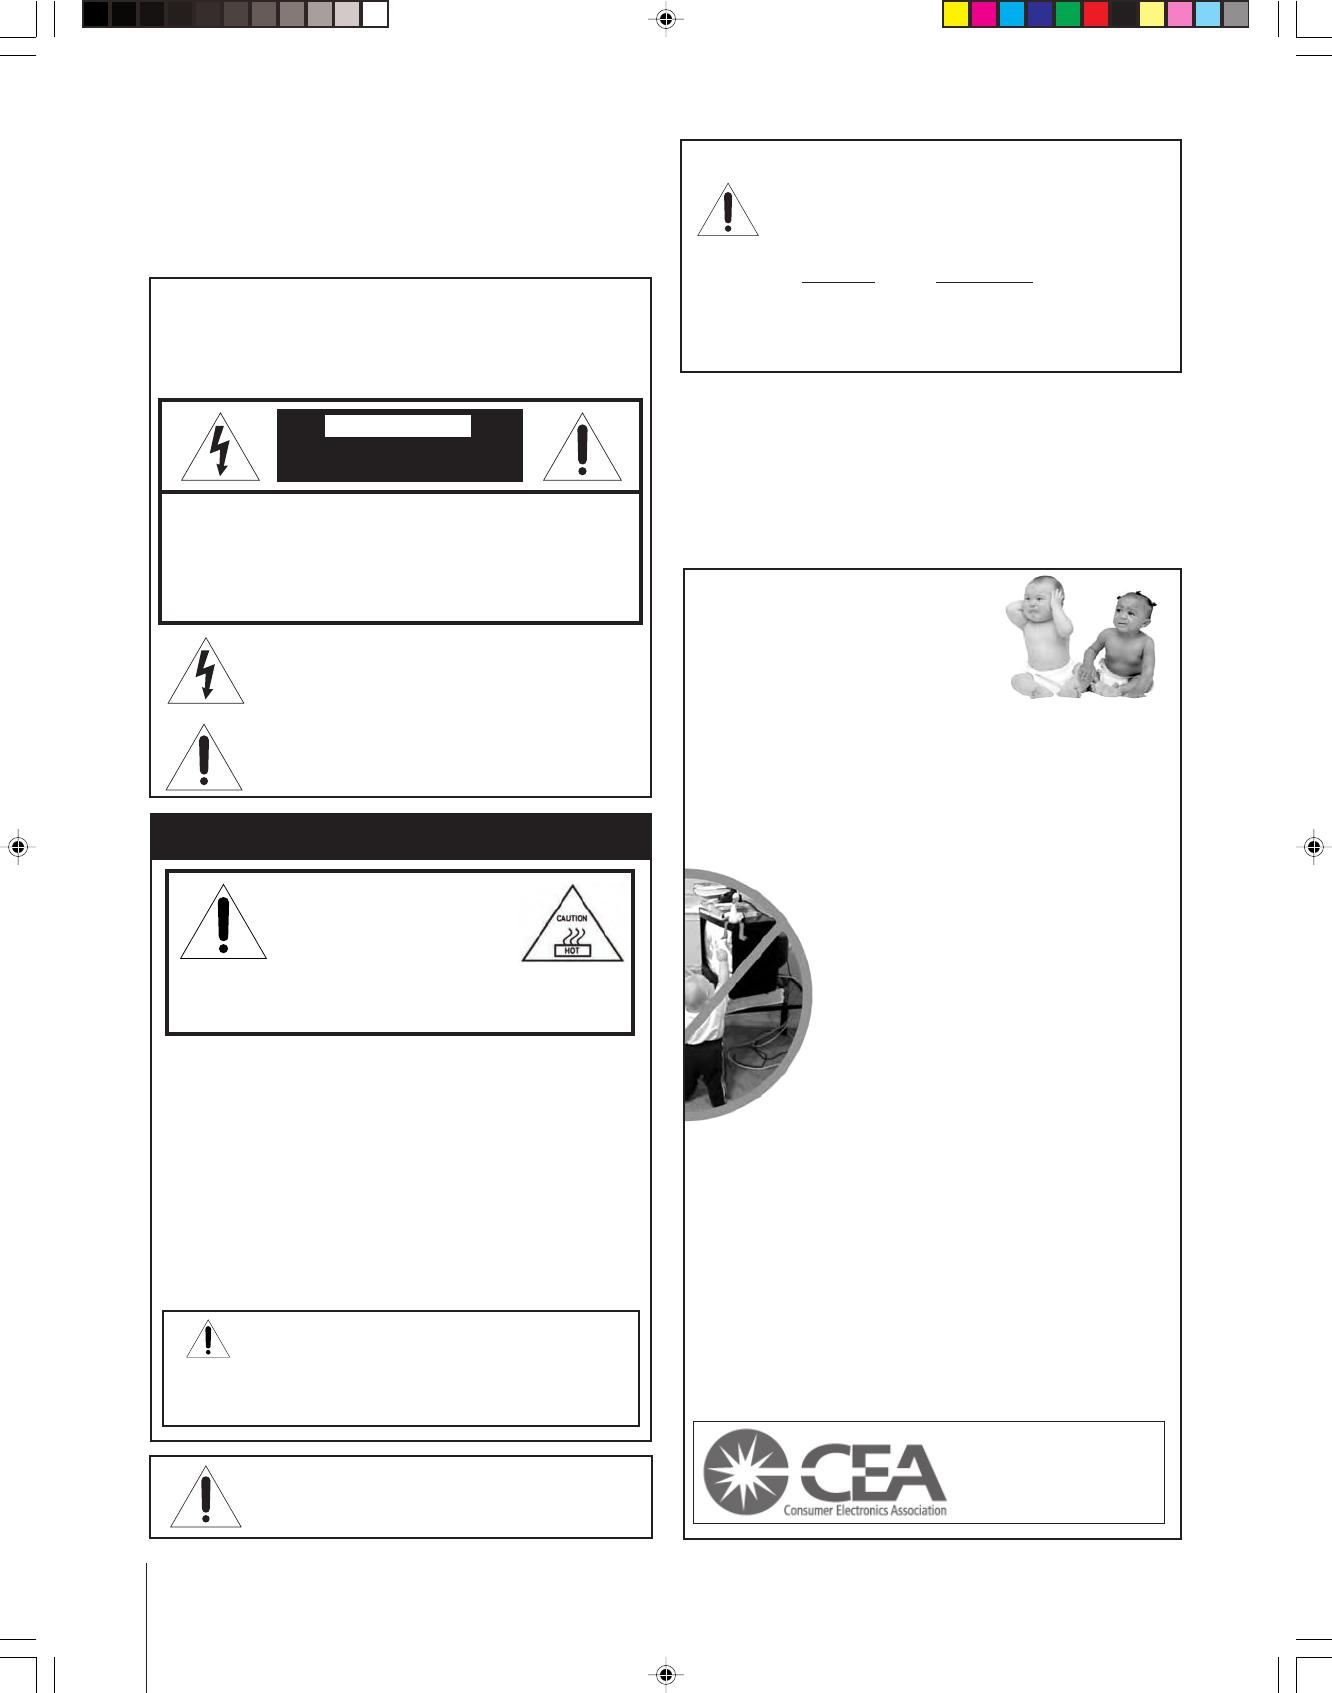 Toshiba Wiring Diagram Electrical Schematics Ps4 52hm95 Diagrams U2022